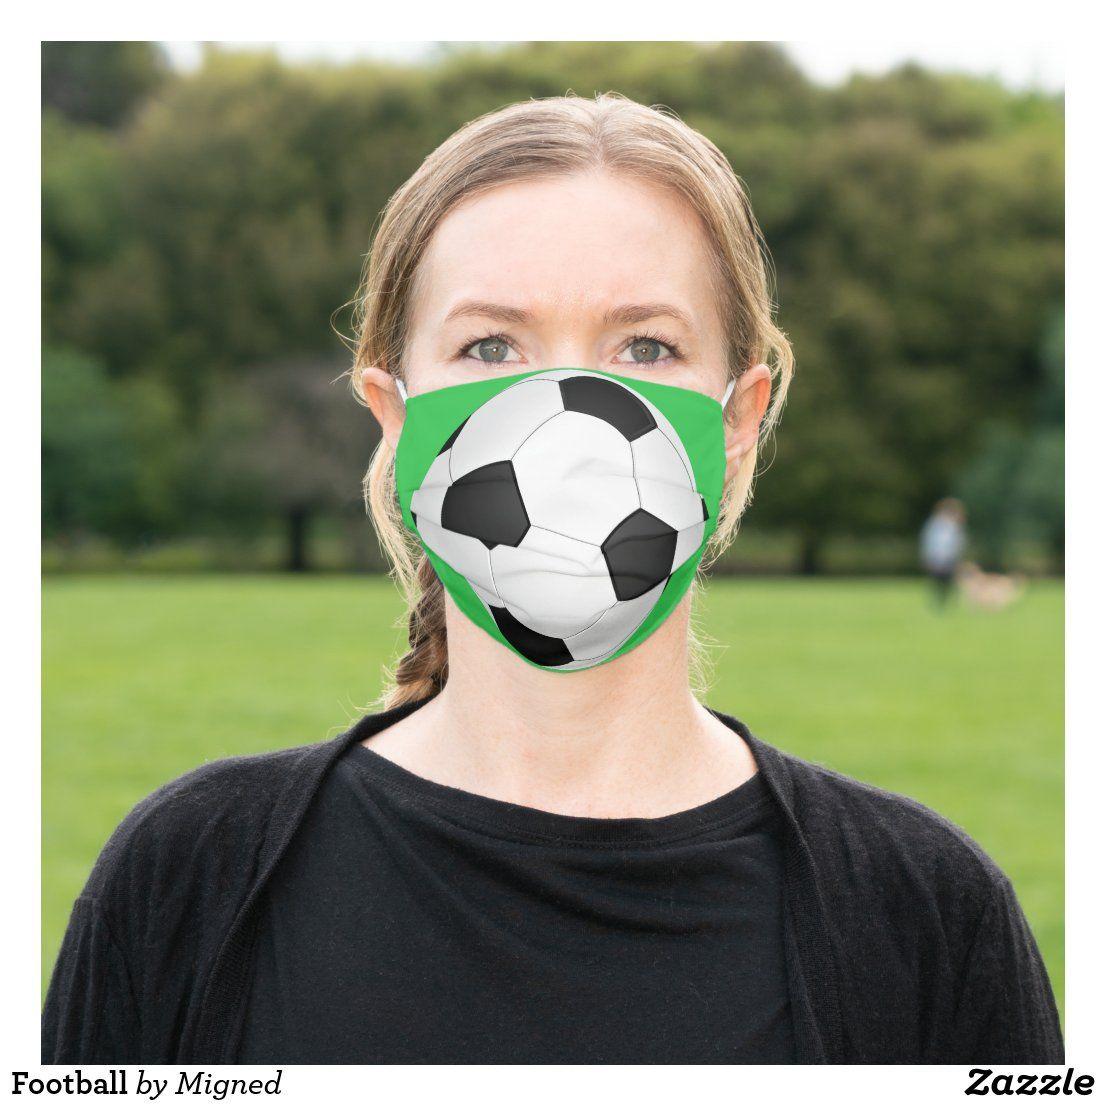 Football Cloth Face Mask Zazzle Com In 2020 Soccer Ball Soccer Face Mask